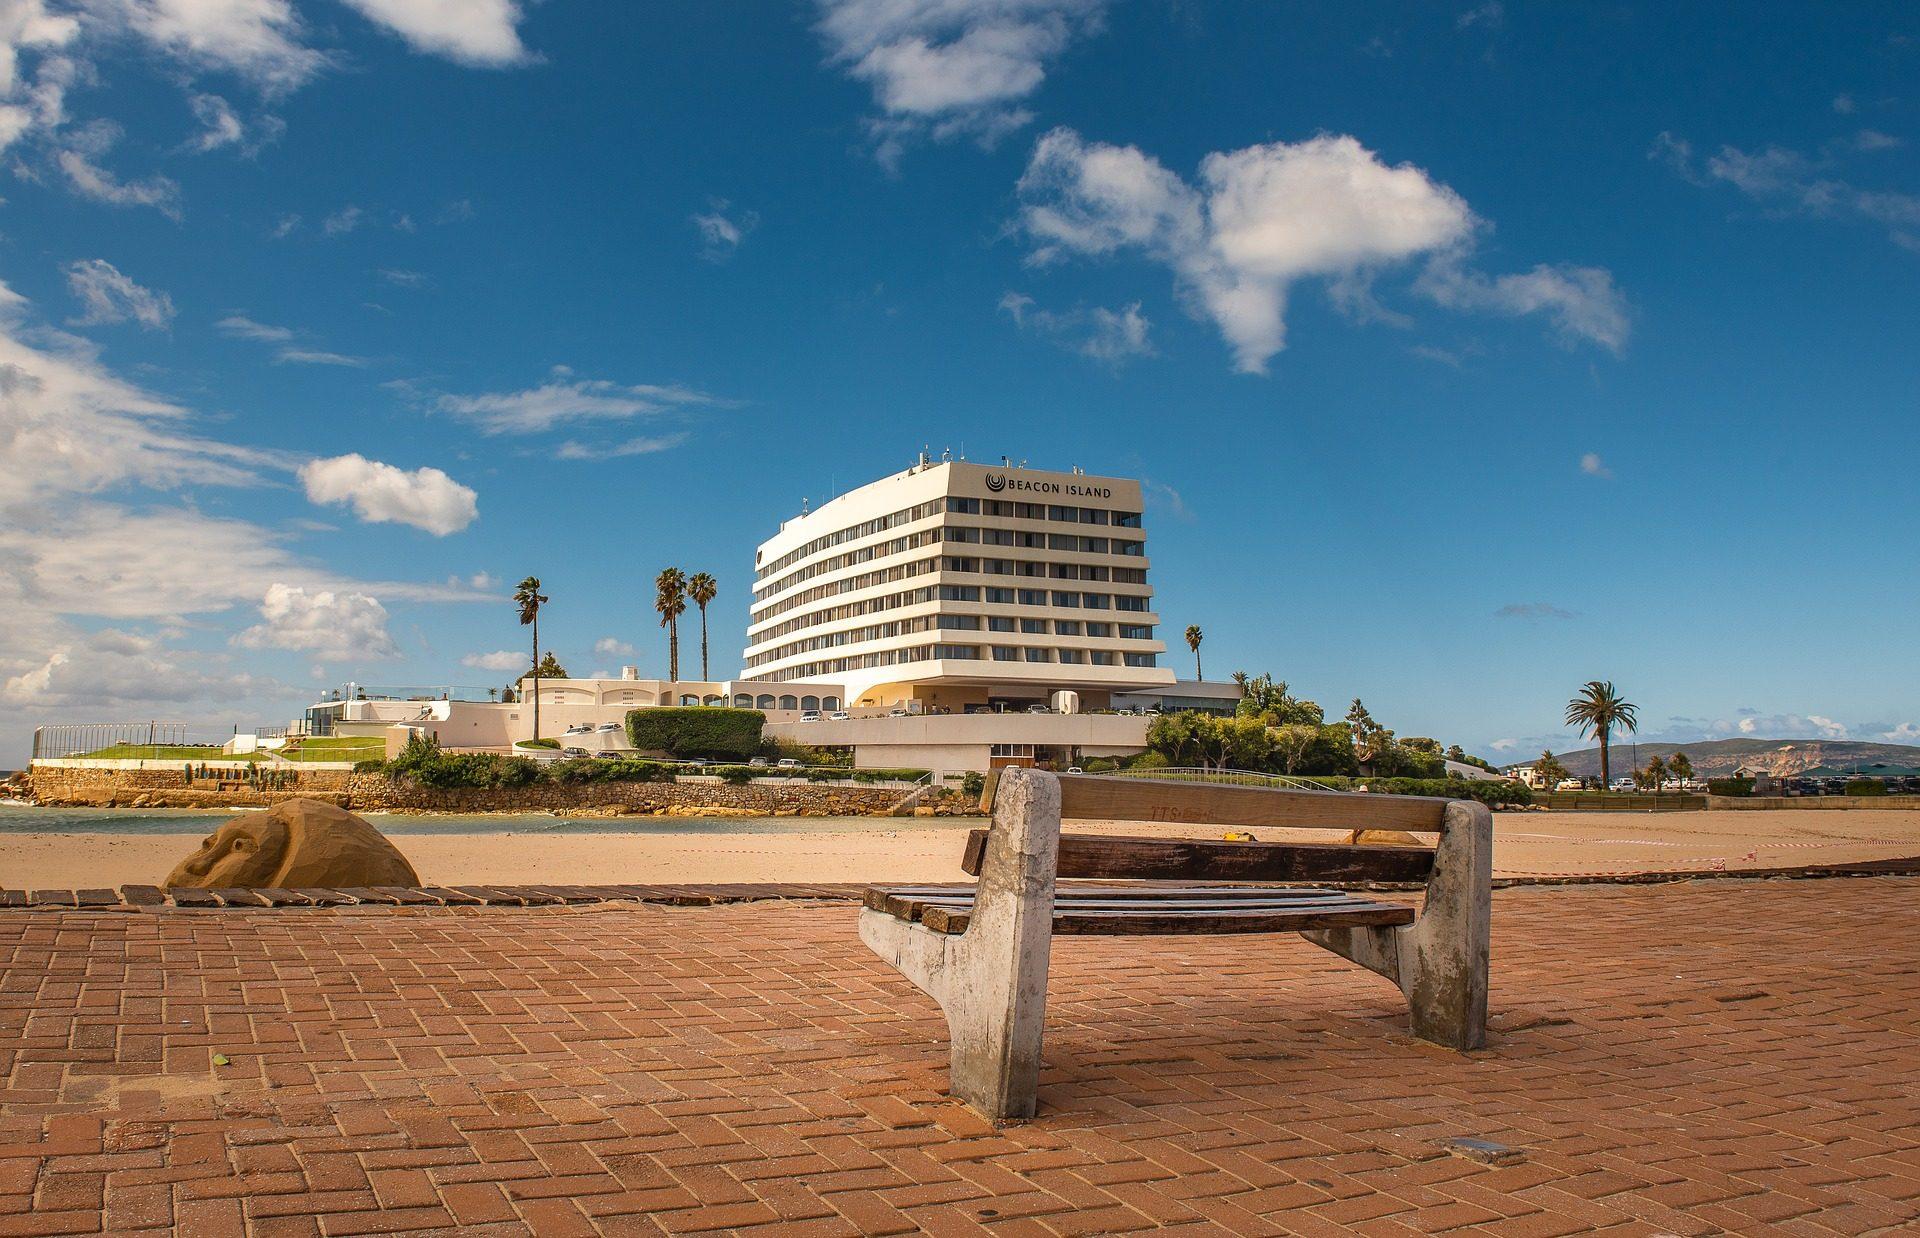 plettenberg-bay-hotels-zuid-afrika